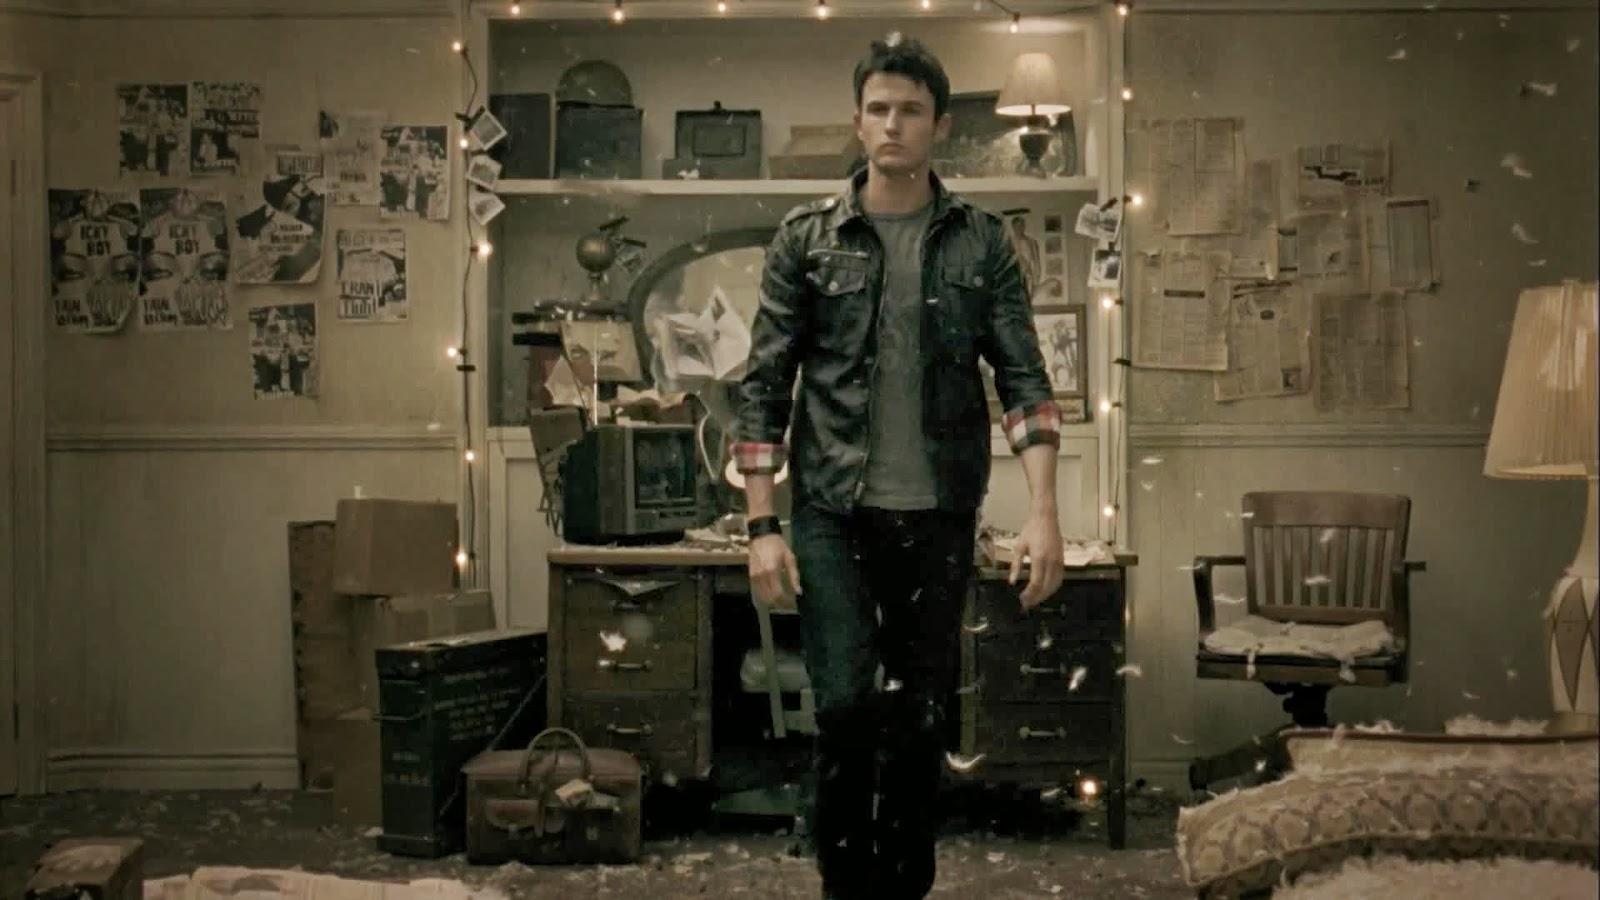 Green Day - 21 Guns [Official Music Video] - Wallpapers ...